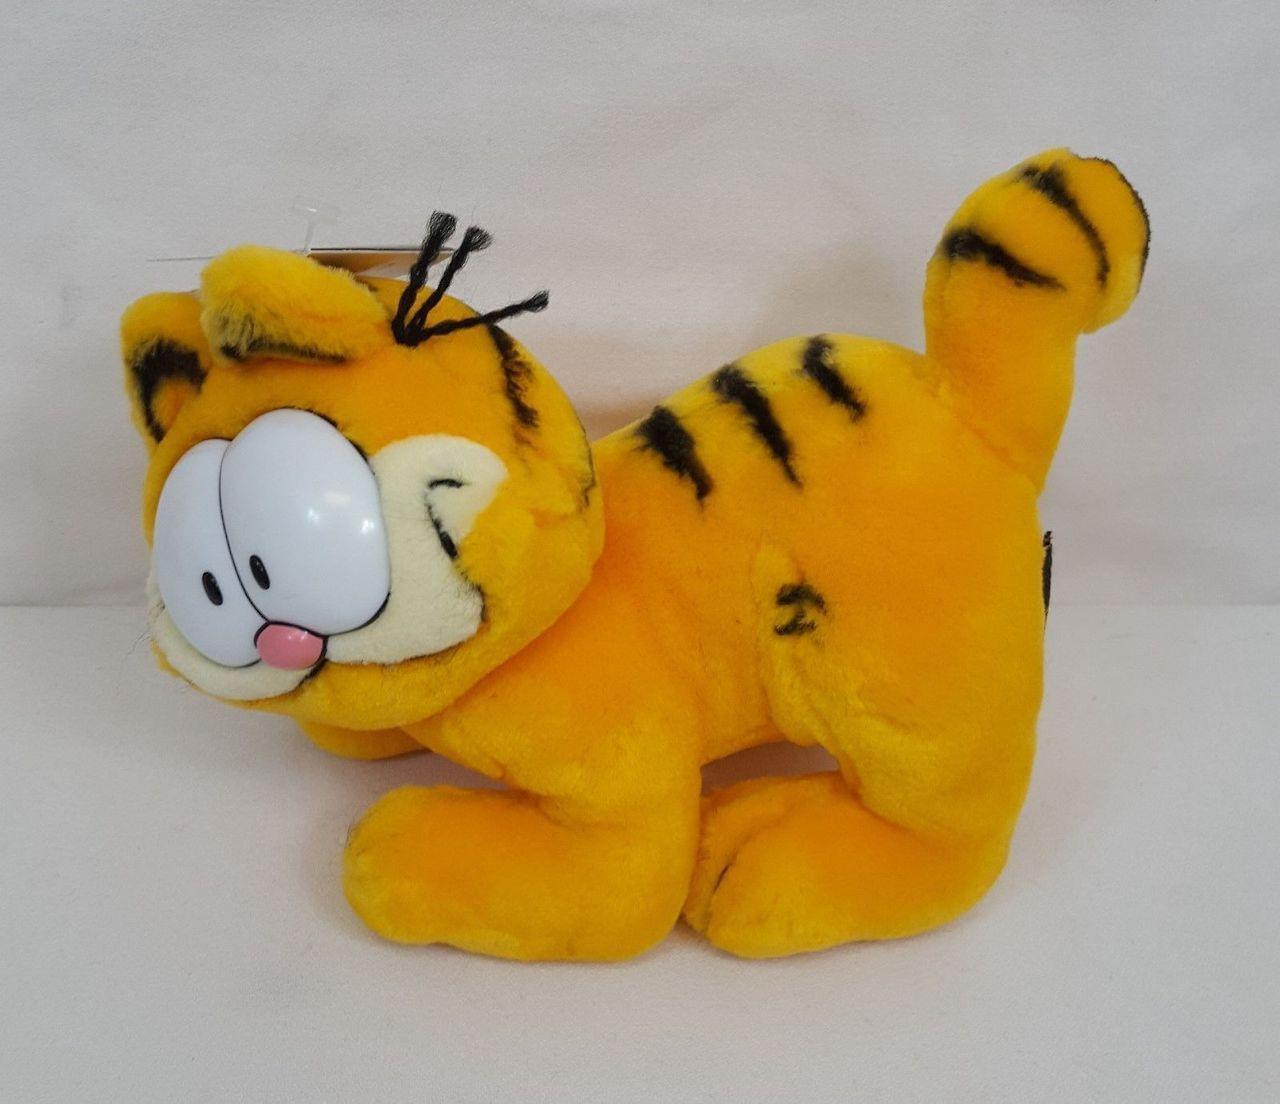 a095f50b12956 RARE Vintage 1978 Fine Toy WANNA PLAY GARFIELD Standing Plush Cat ...